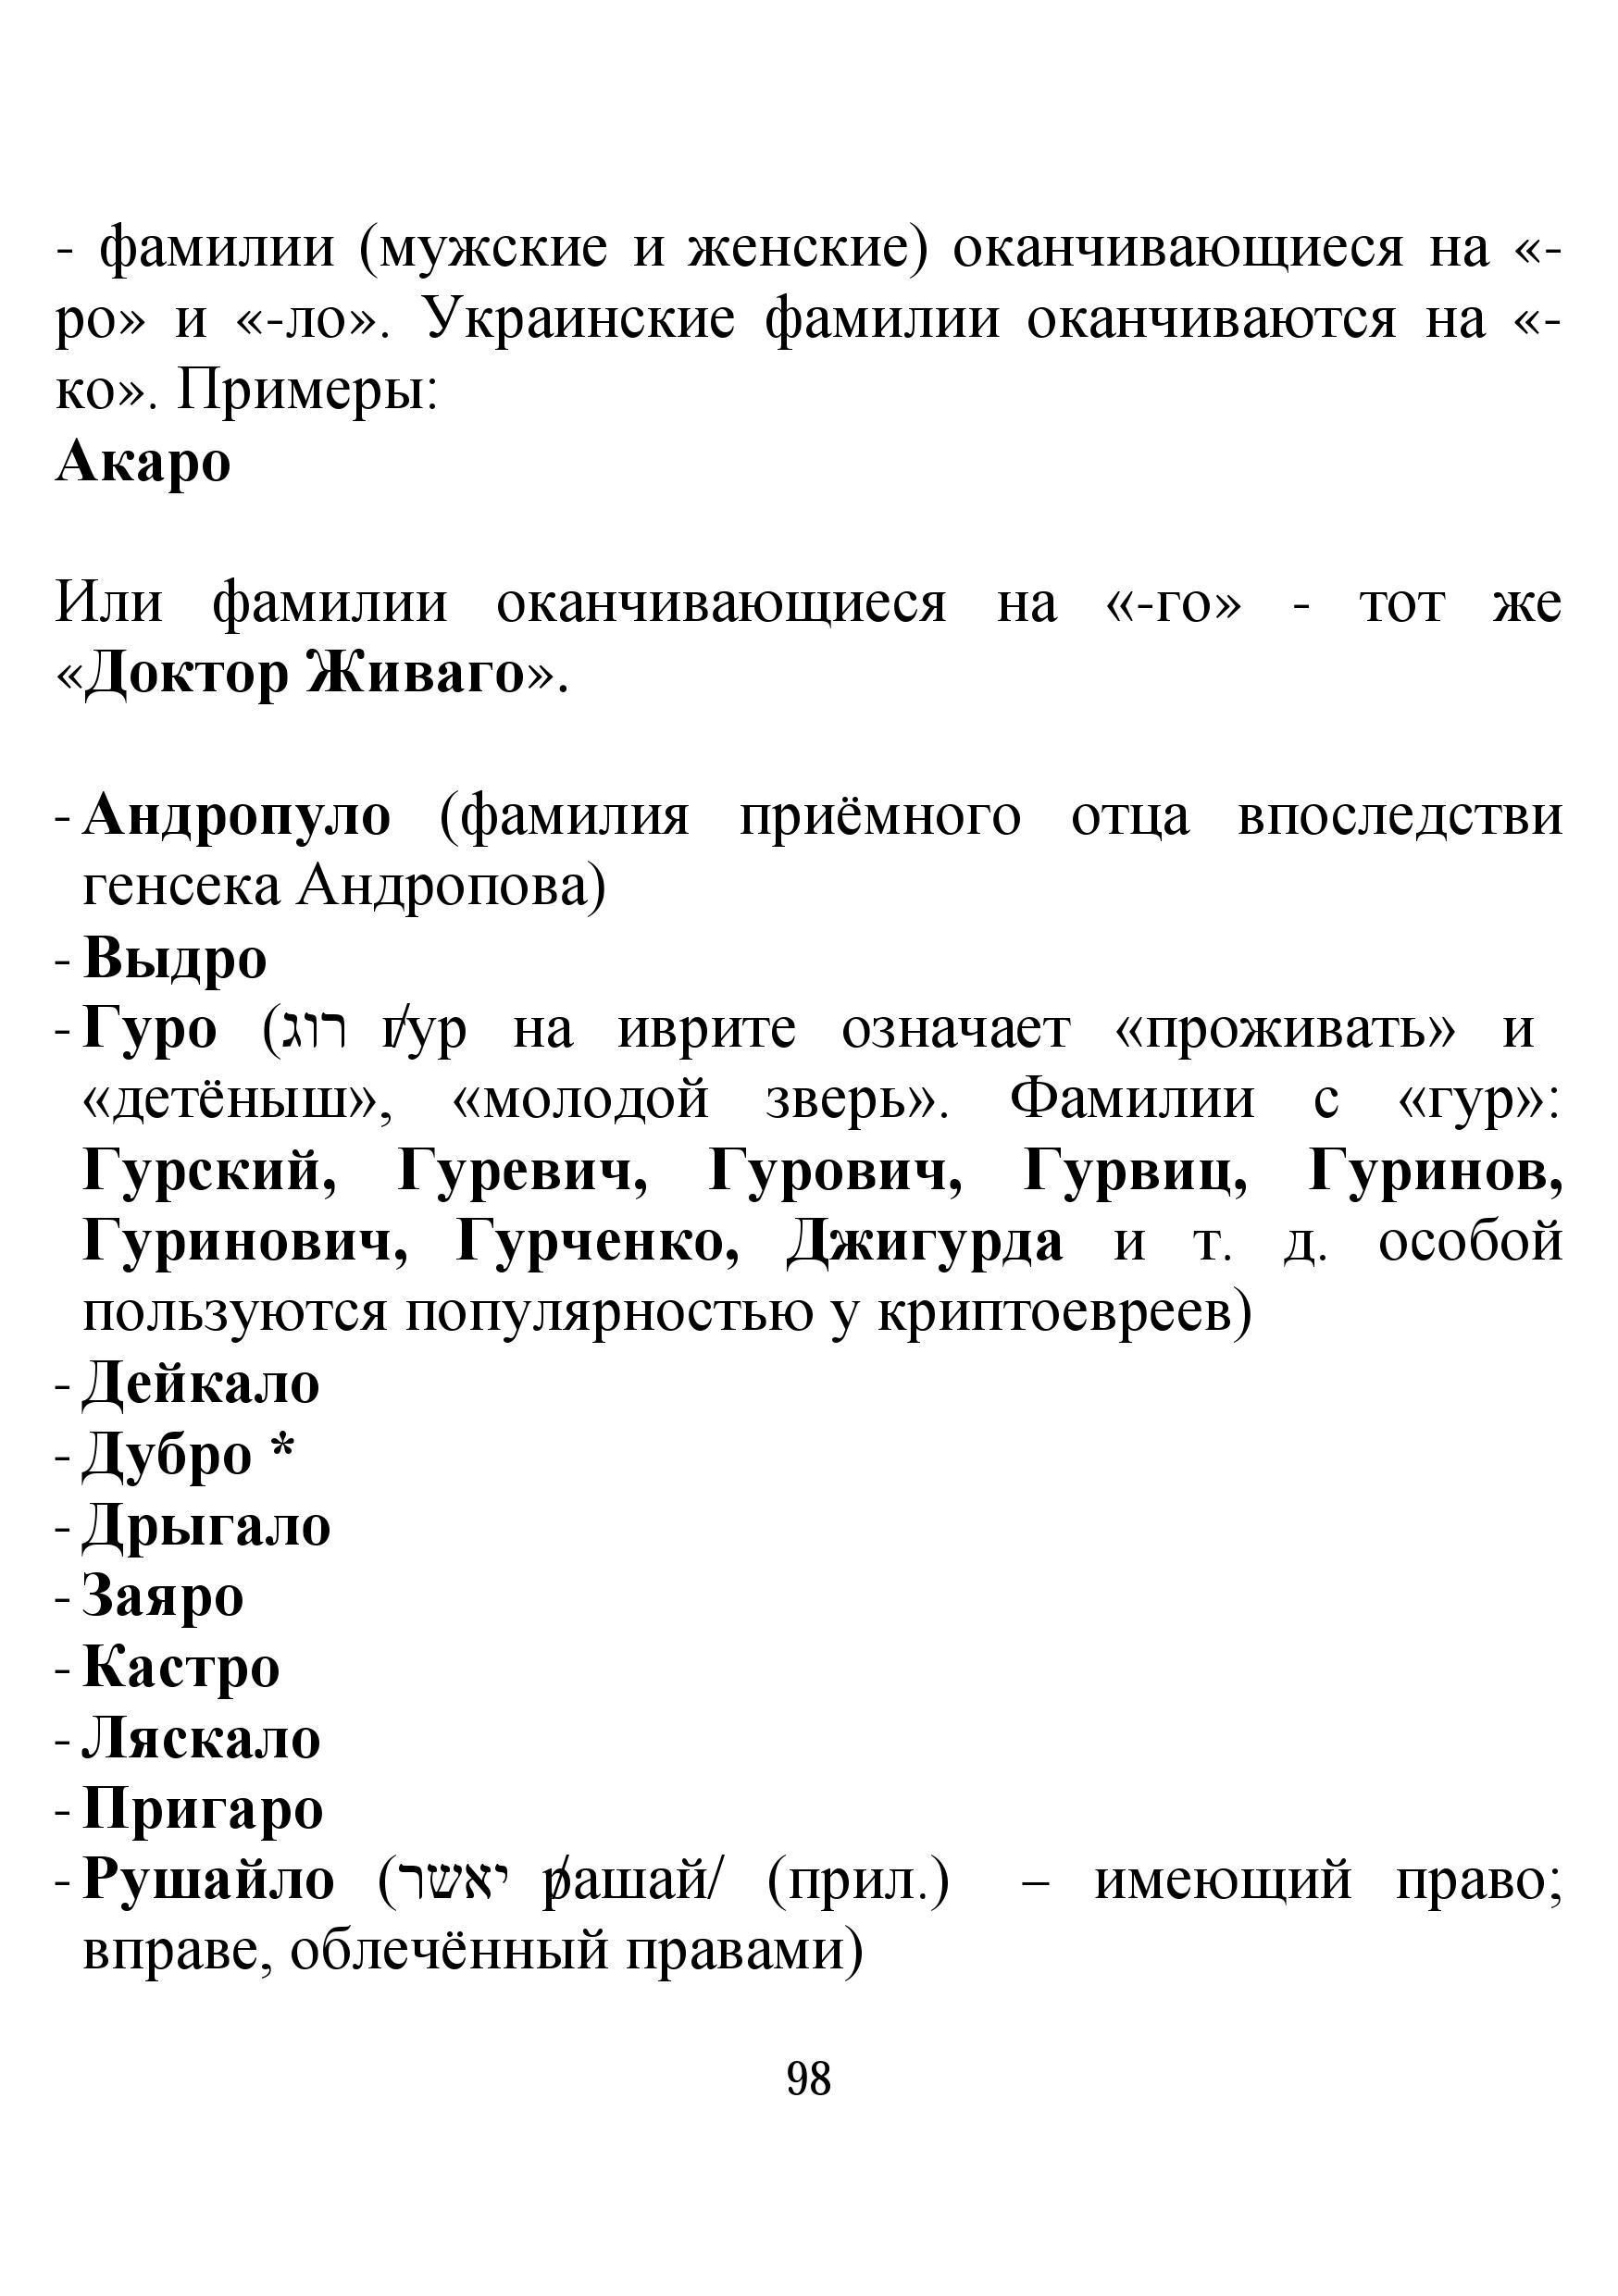 http://s0.uploads.ru/f28Wd.jpg